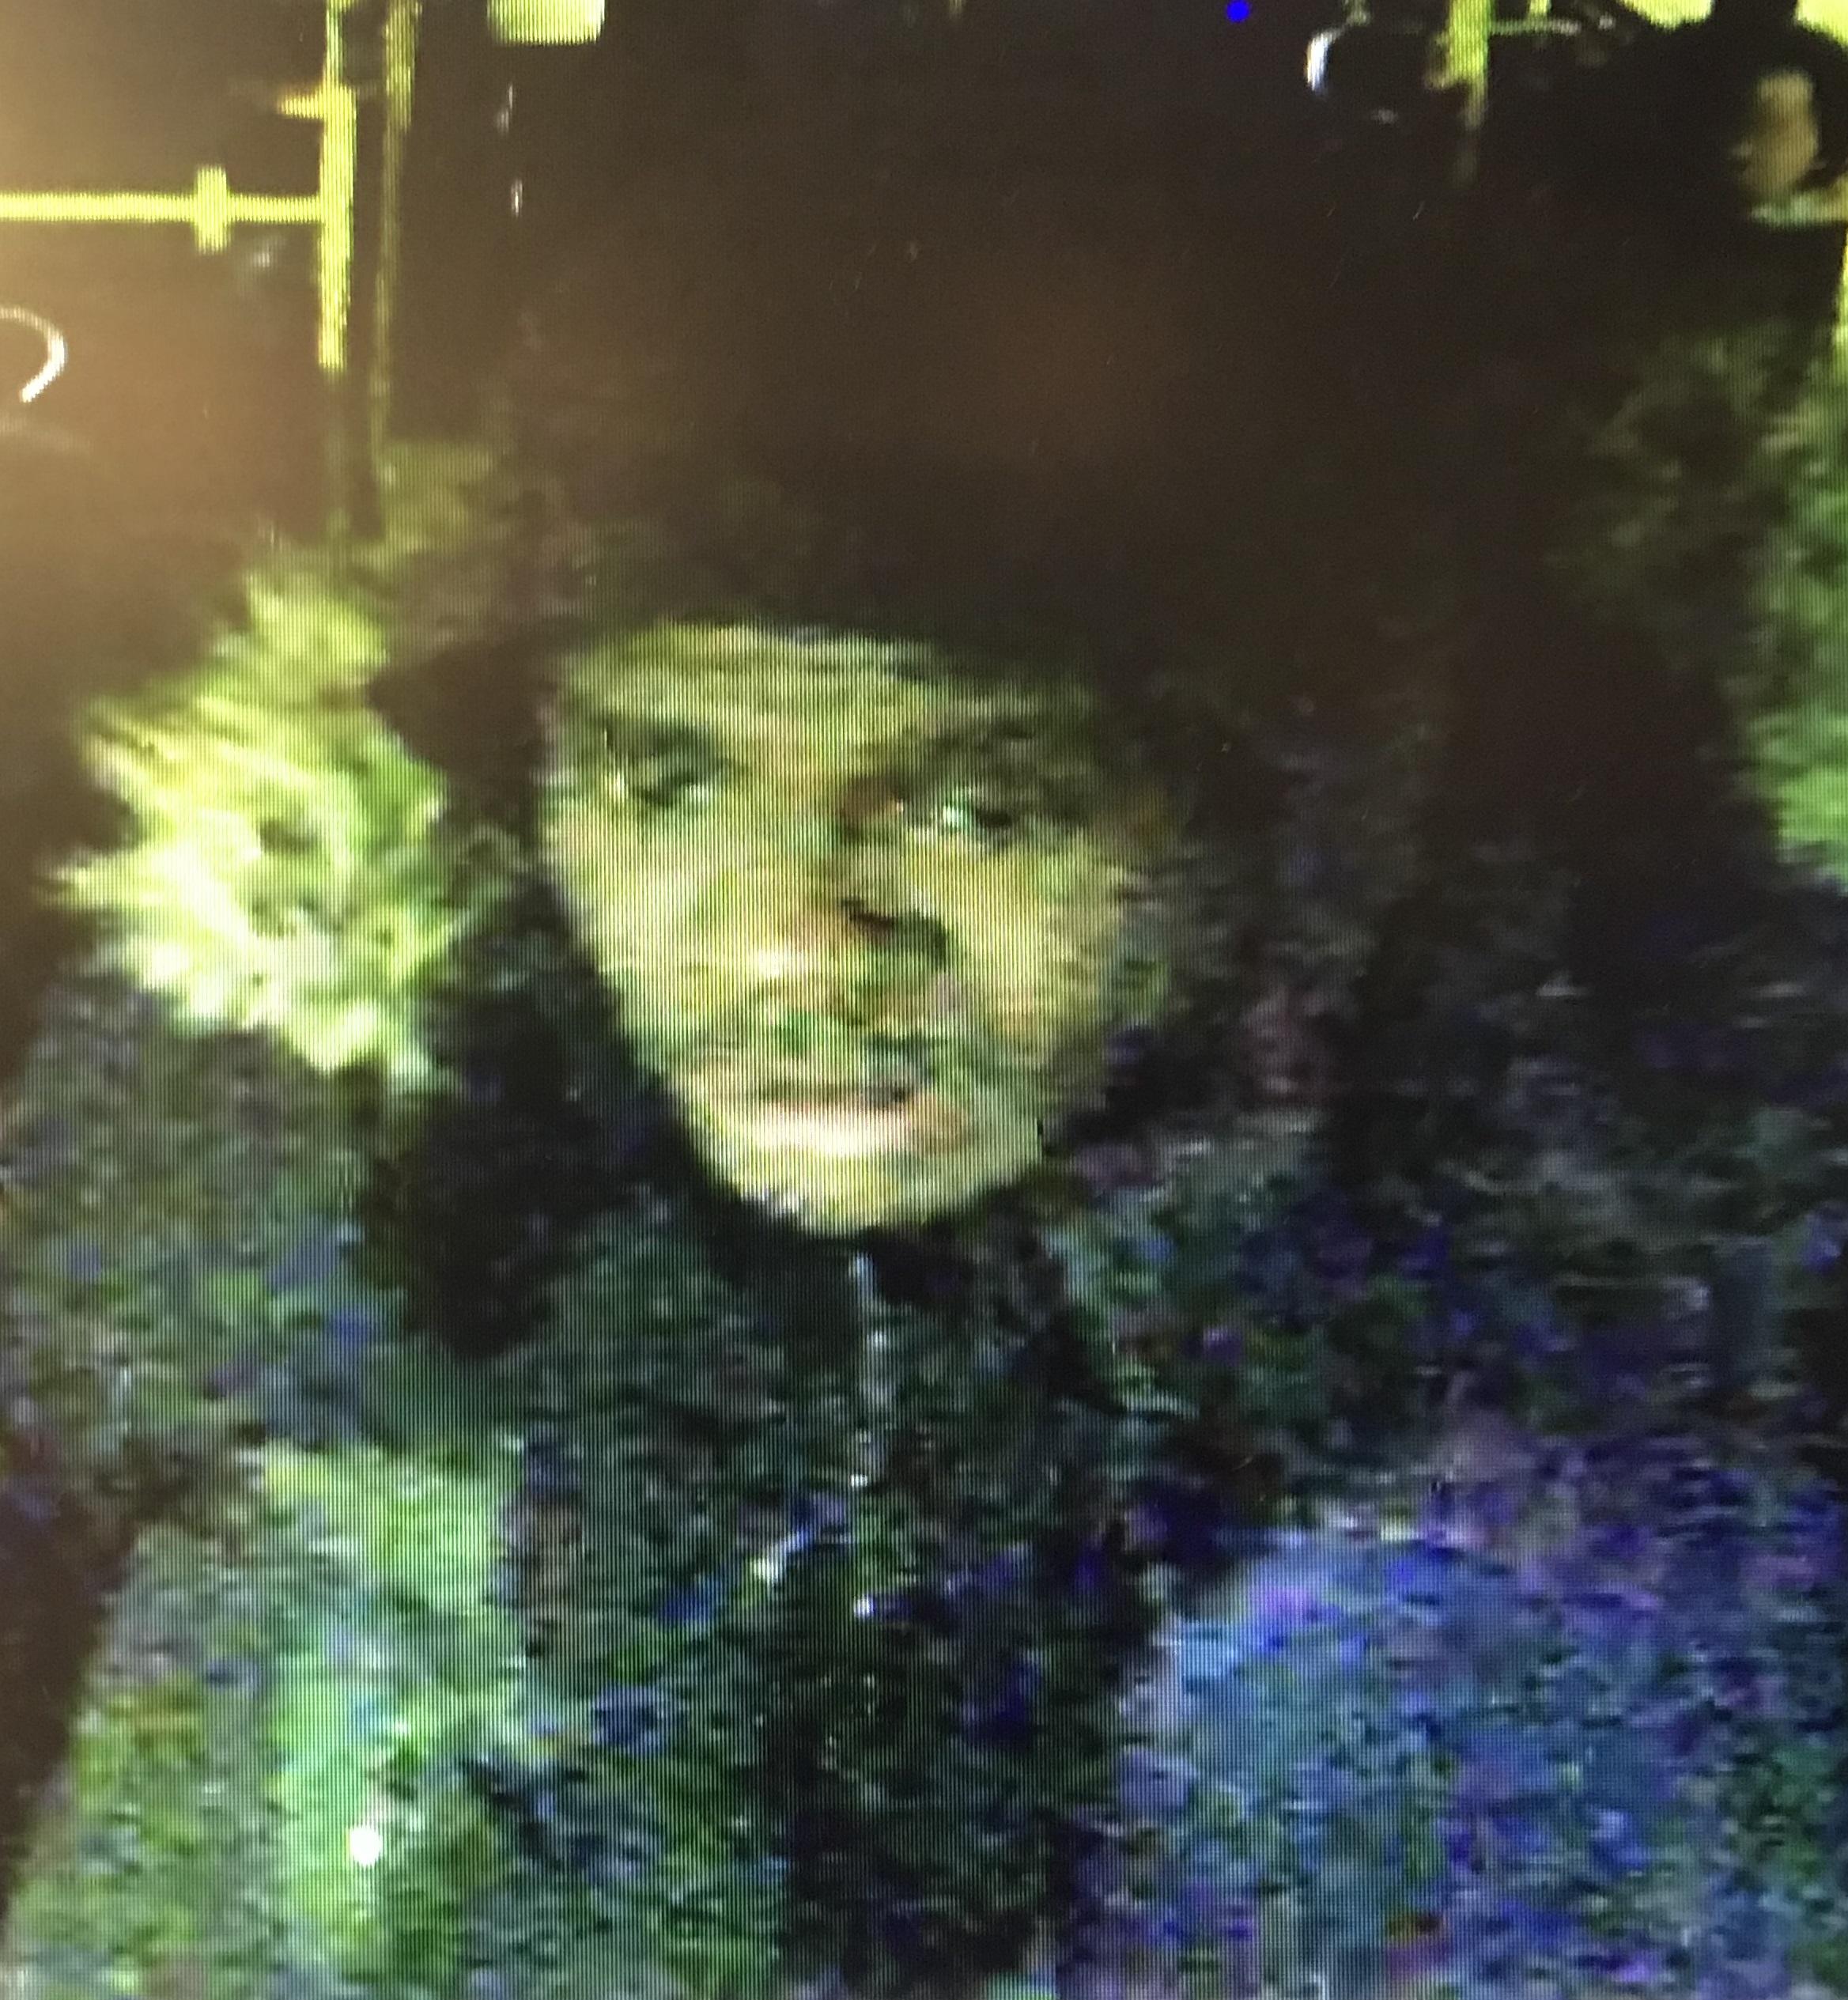 Help Identify 5 Grand Larceny Suspects